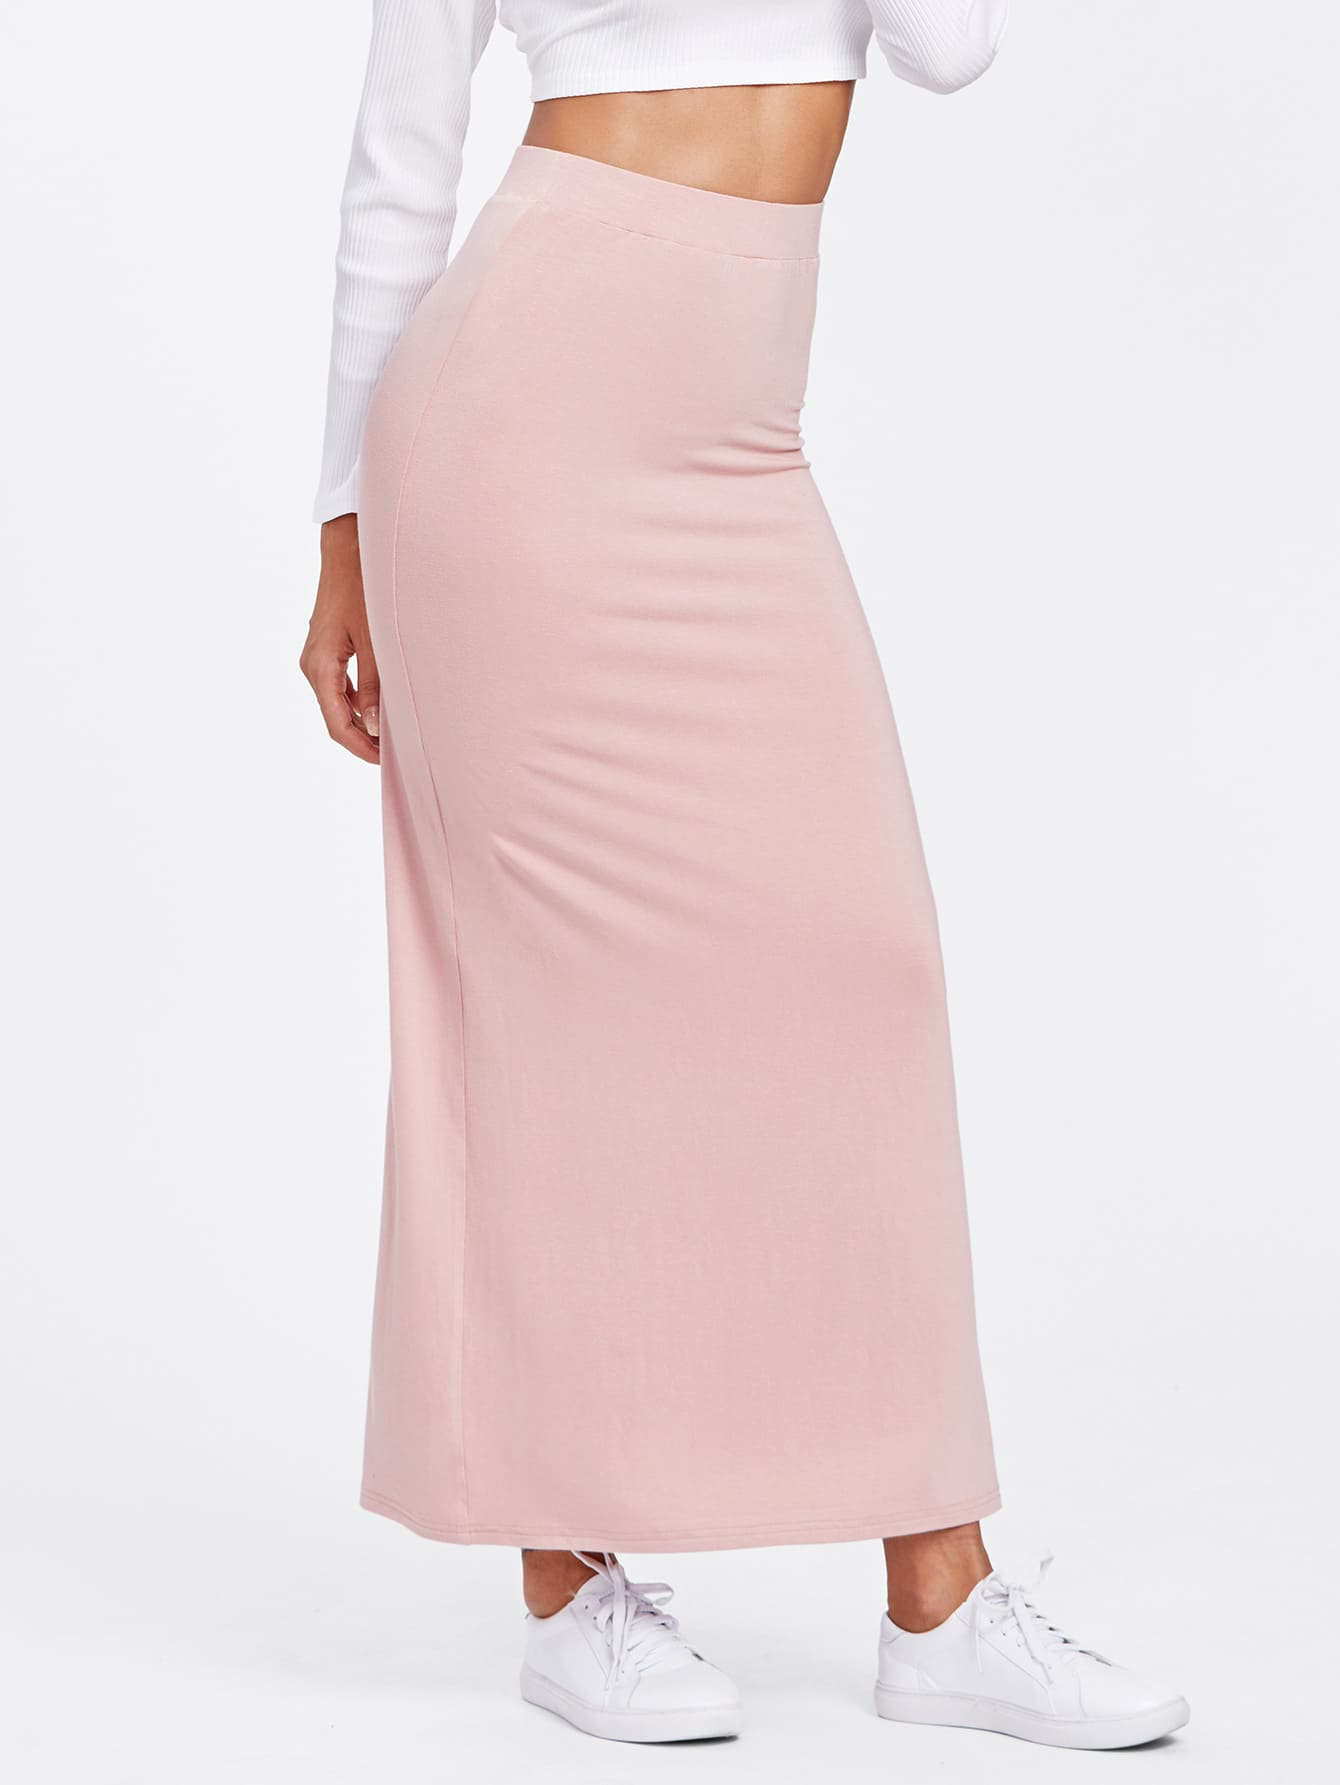 Elastic Waist Longline Jersey Skirt heather grey elastic waist jersey pencil skirt